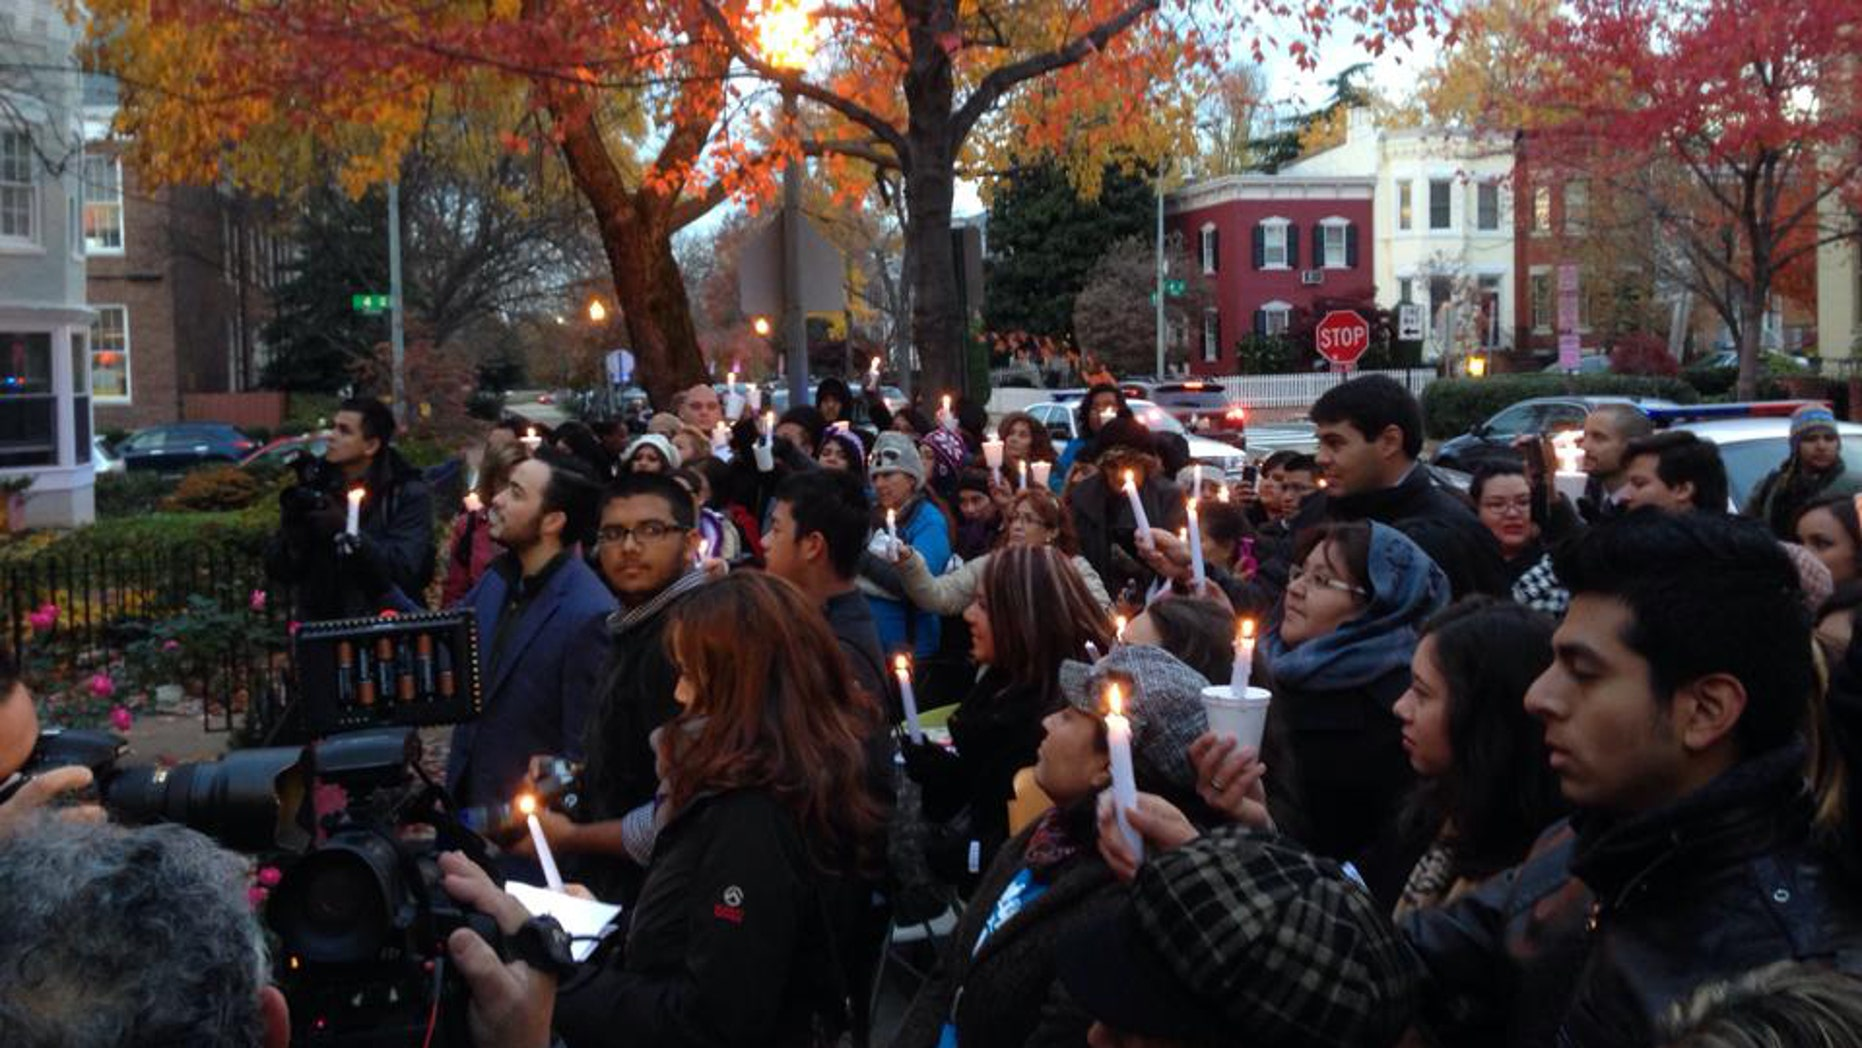 Immigrants hold a protest vigil for immigration reform outside the home of House Speaker John Boehner.